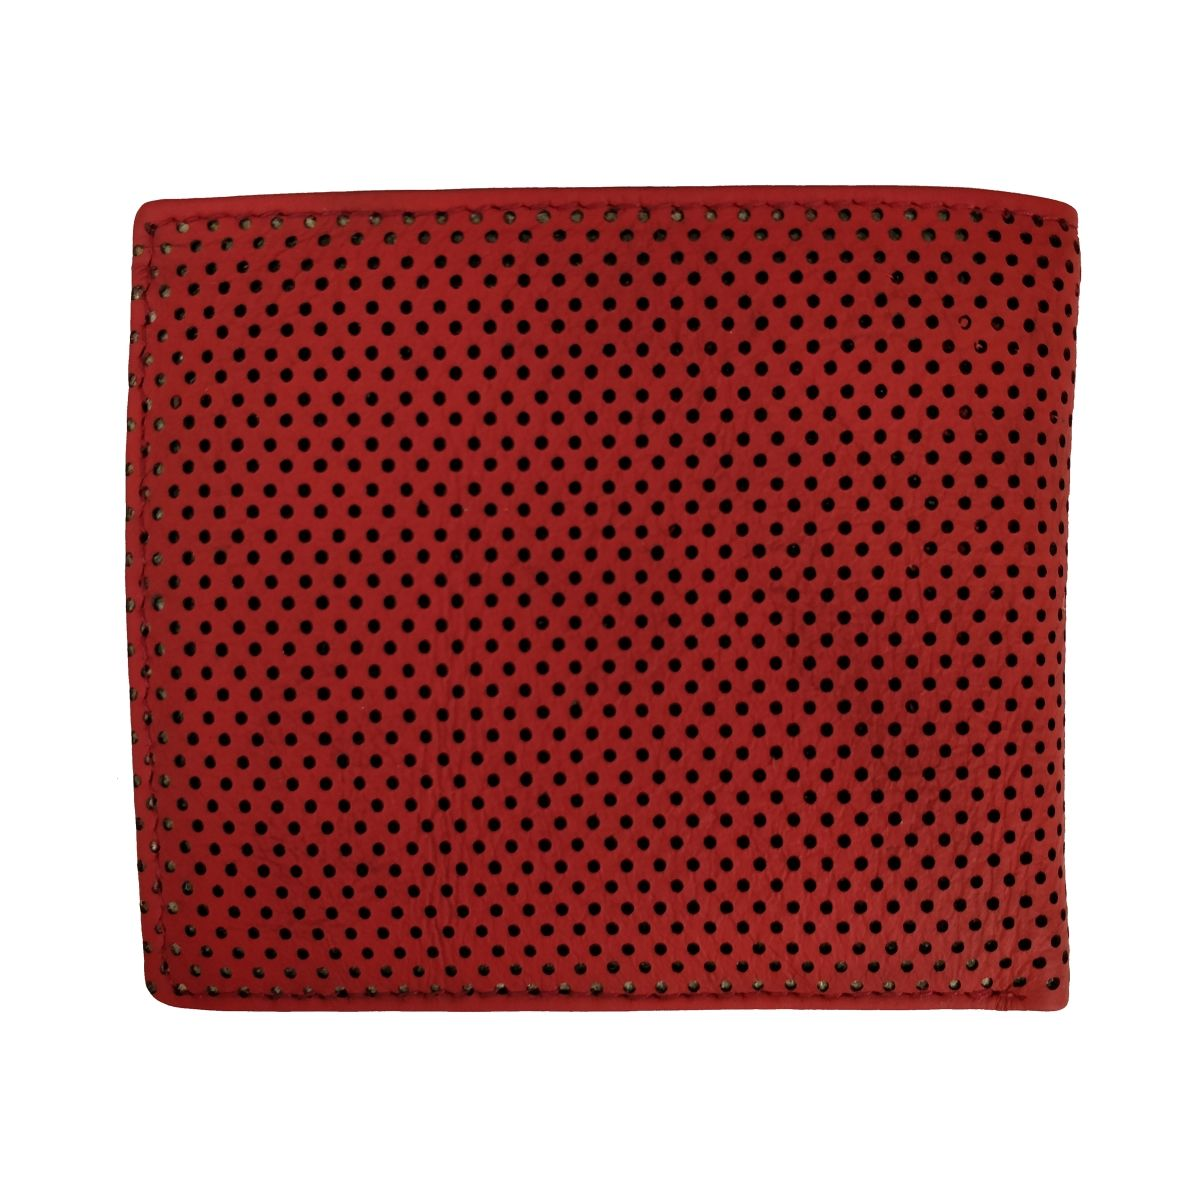 solo ארנק עור עם תא למטבעות  - אדום\לבן